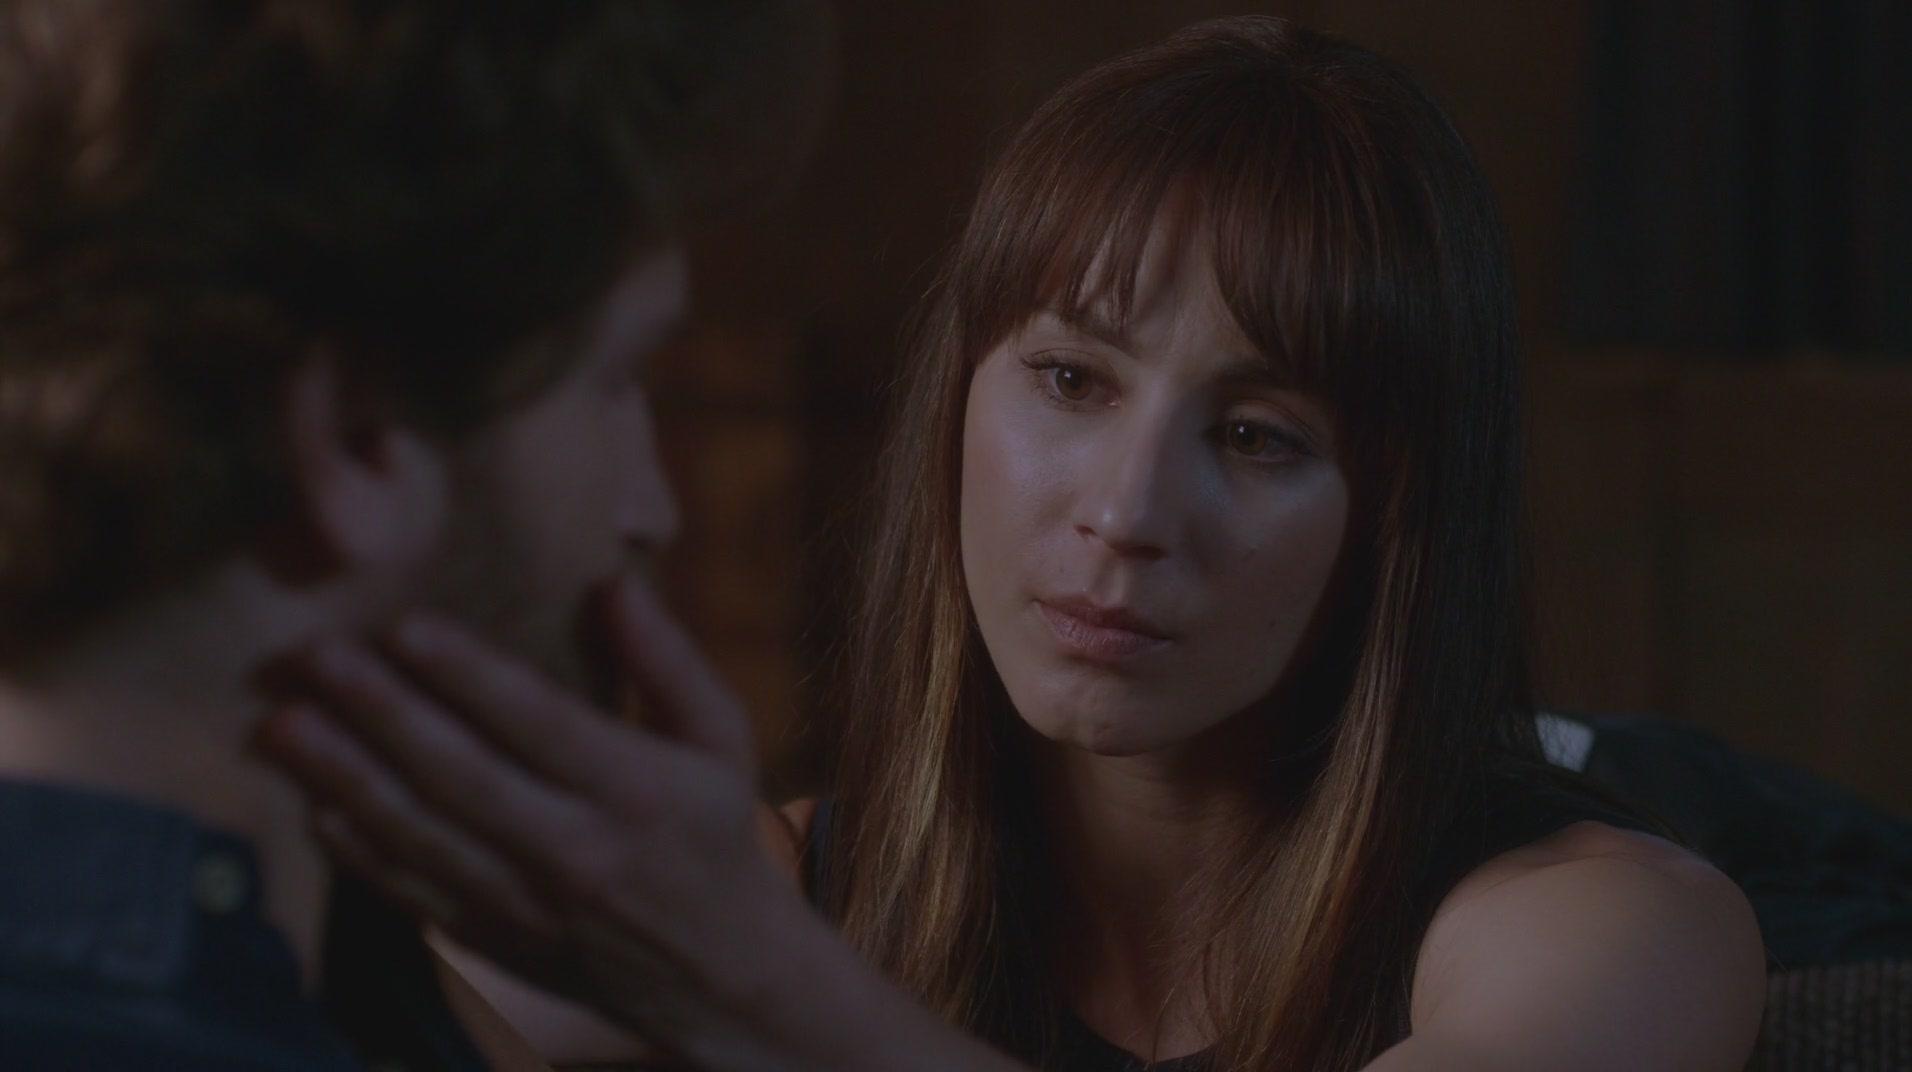 Quand Spencer a commencé à sortir avec Toby